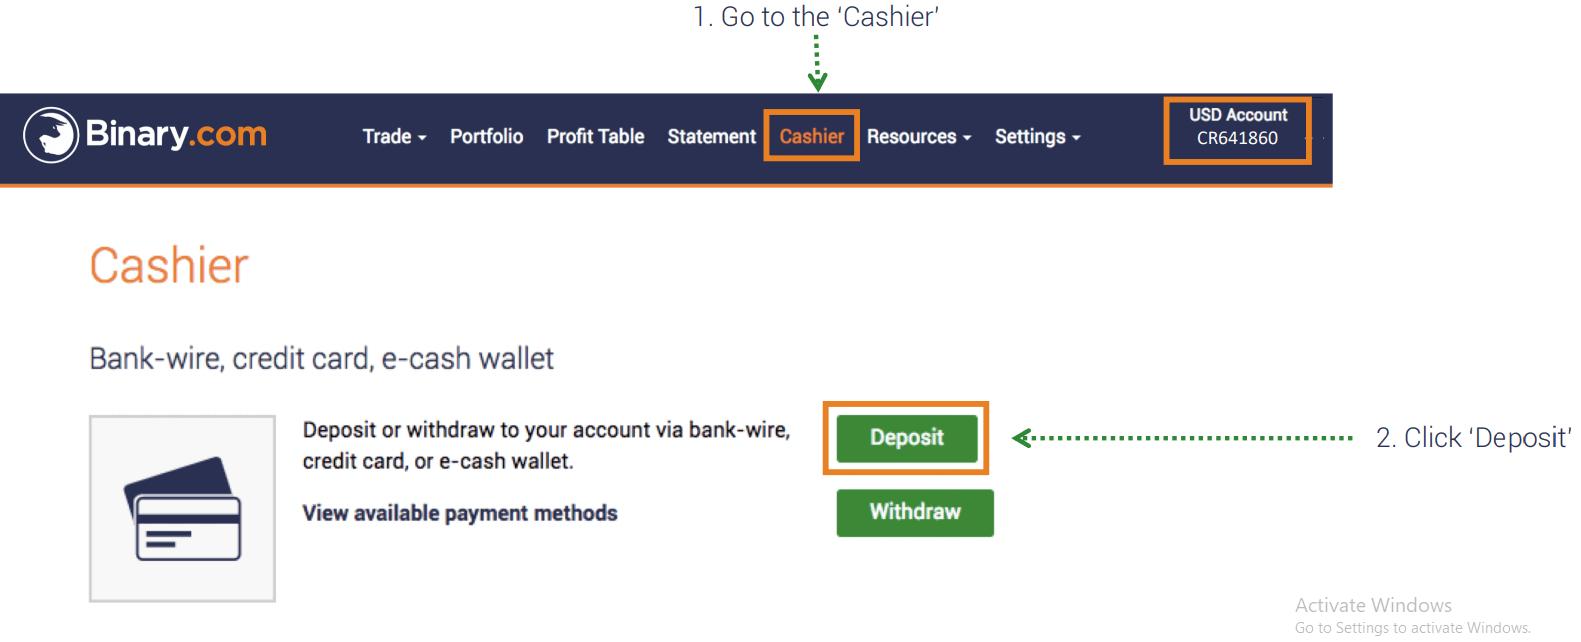 How to Deposit Money in Binary.com